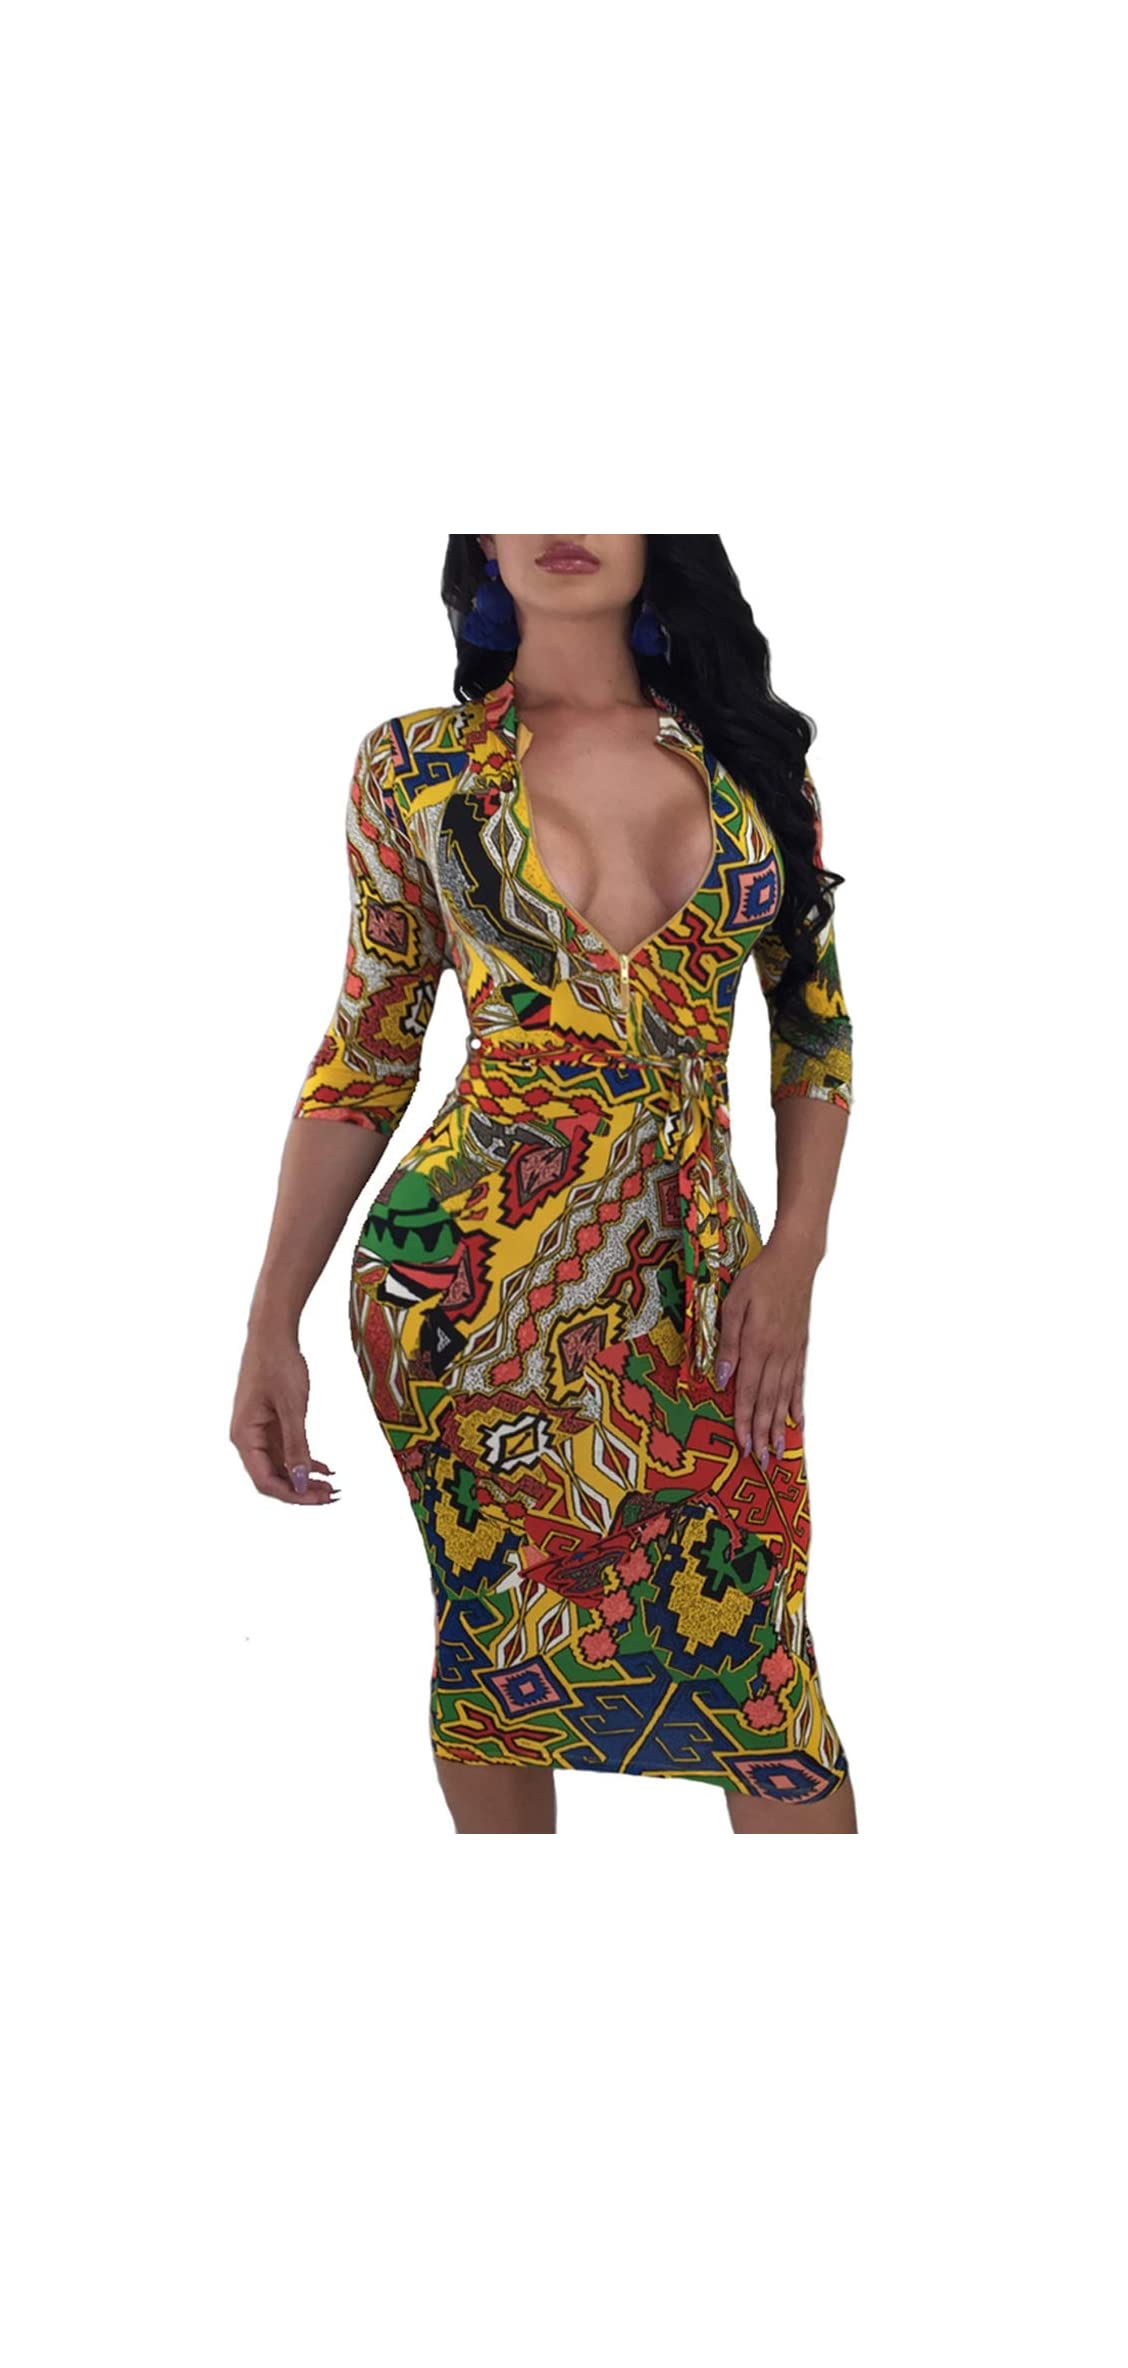 Bodycon Dresses For Women Sexy V-neck Casual Floral Juniors Midi